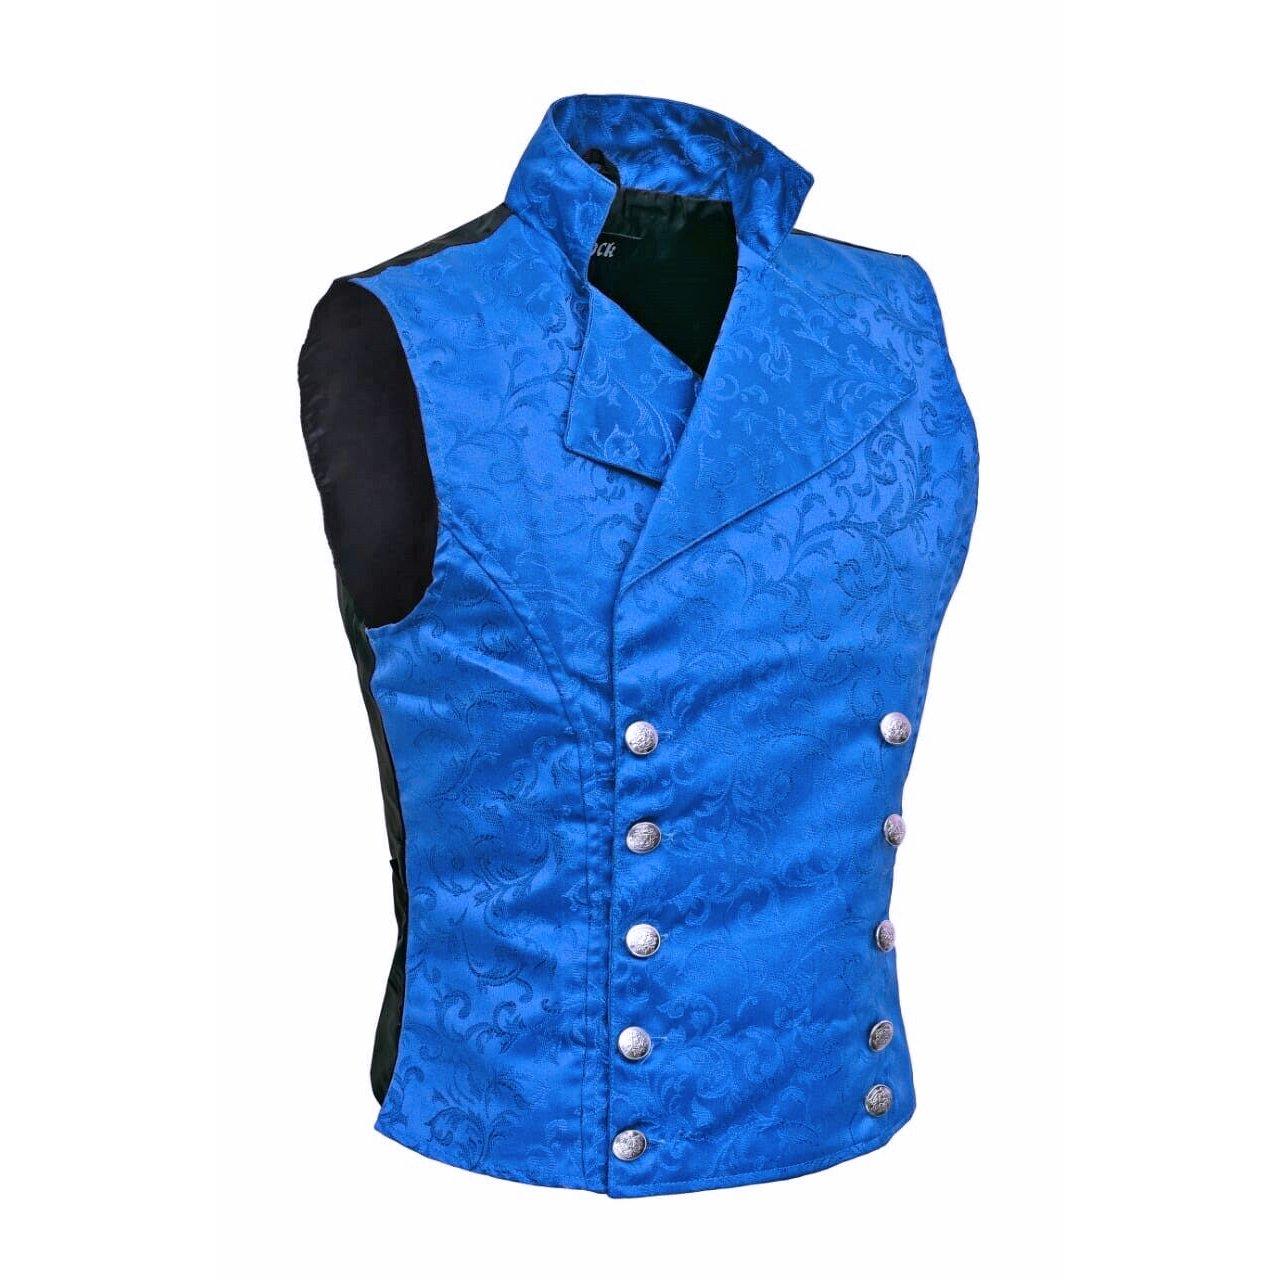 Men's Steampunk Double-breasted Waistcoat Royal Blue Vest Gothic - DARKROCK (side)